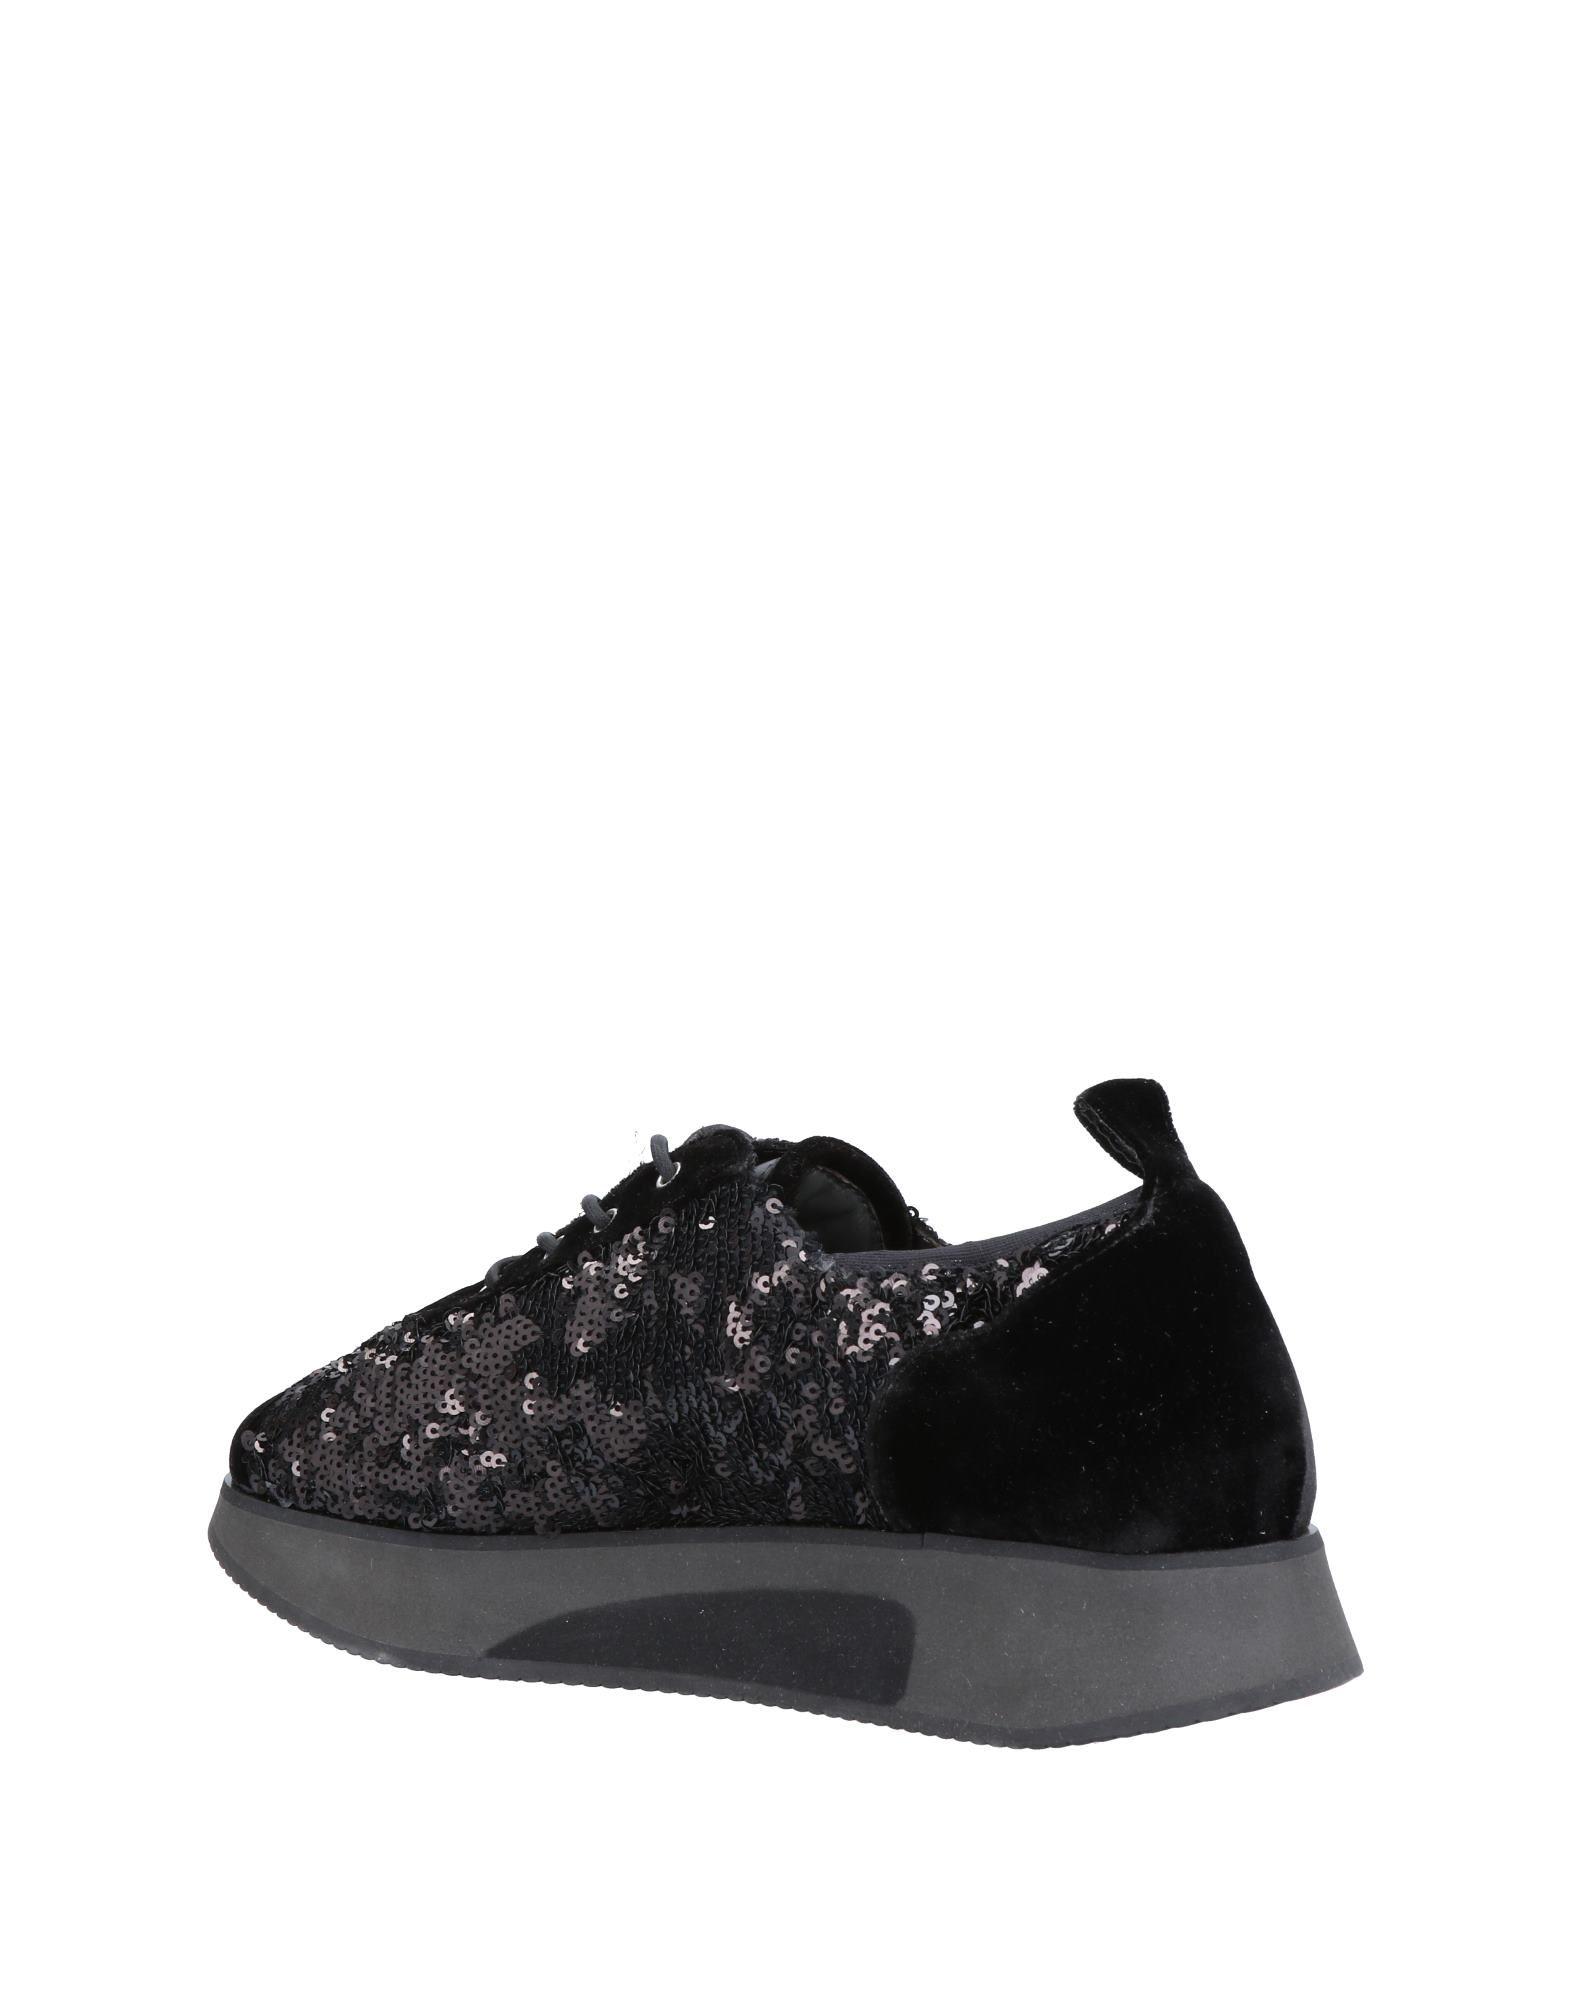 Gut um billige Schuhe zu tragenAlberto 11488520RW Guardiani Sneakers Damen  11488520RW tragenAlberto de4f71